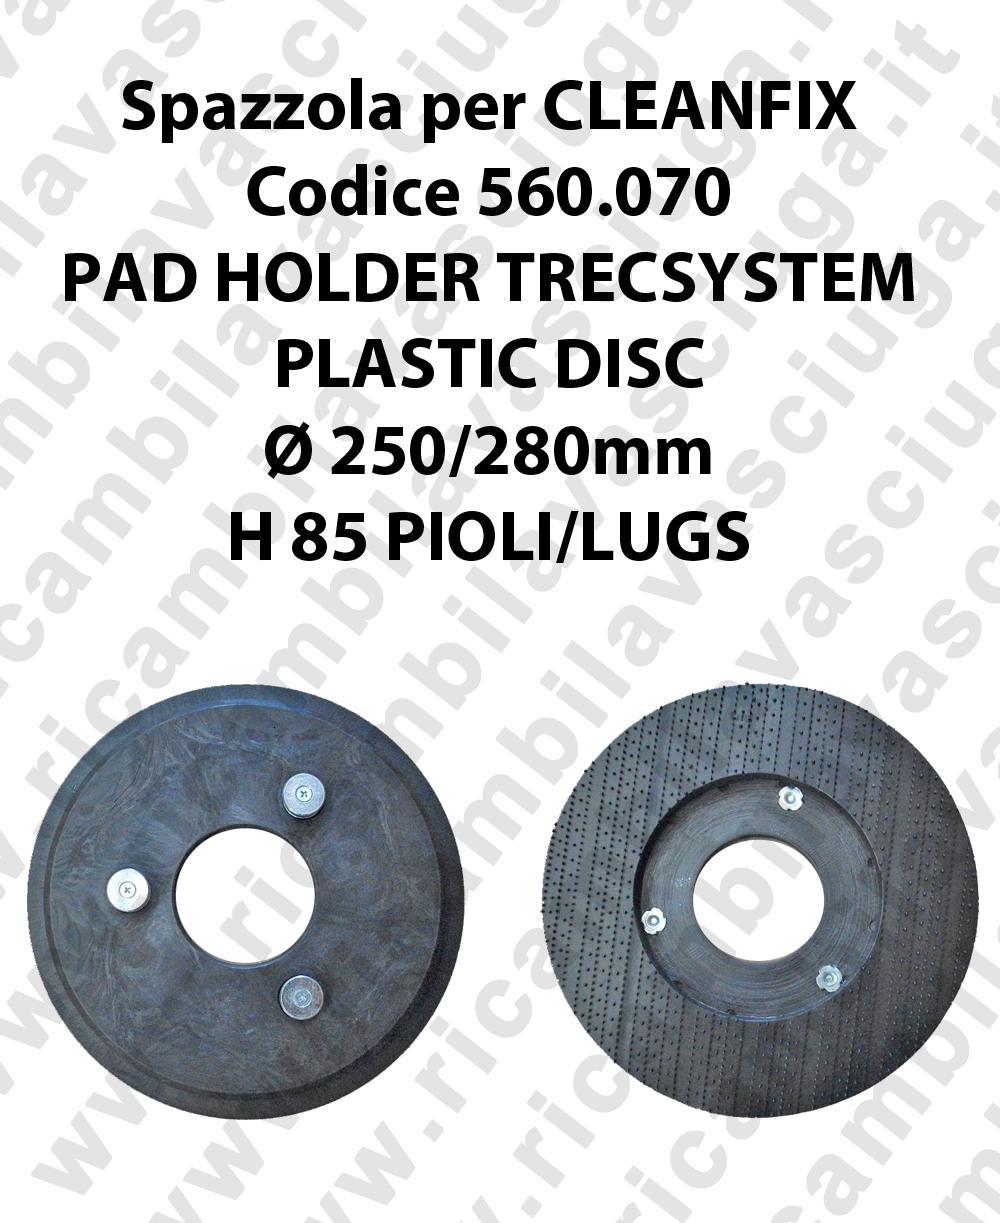 PAD HOLDER TRECSYSTEM  per lavapavimenti CLEANFIX codice 560.070